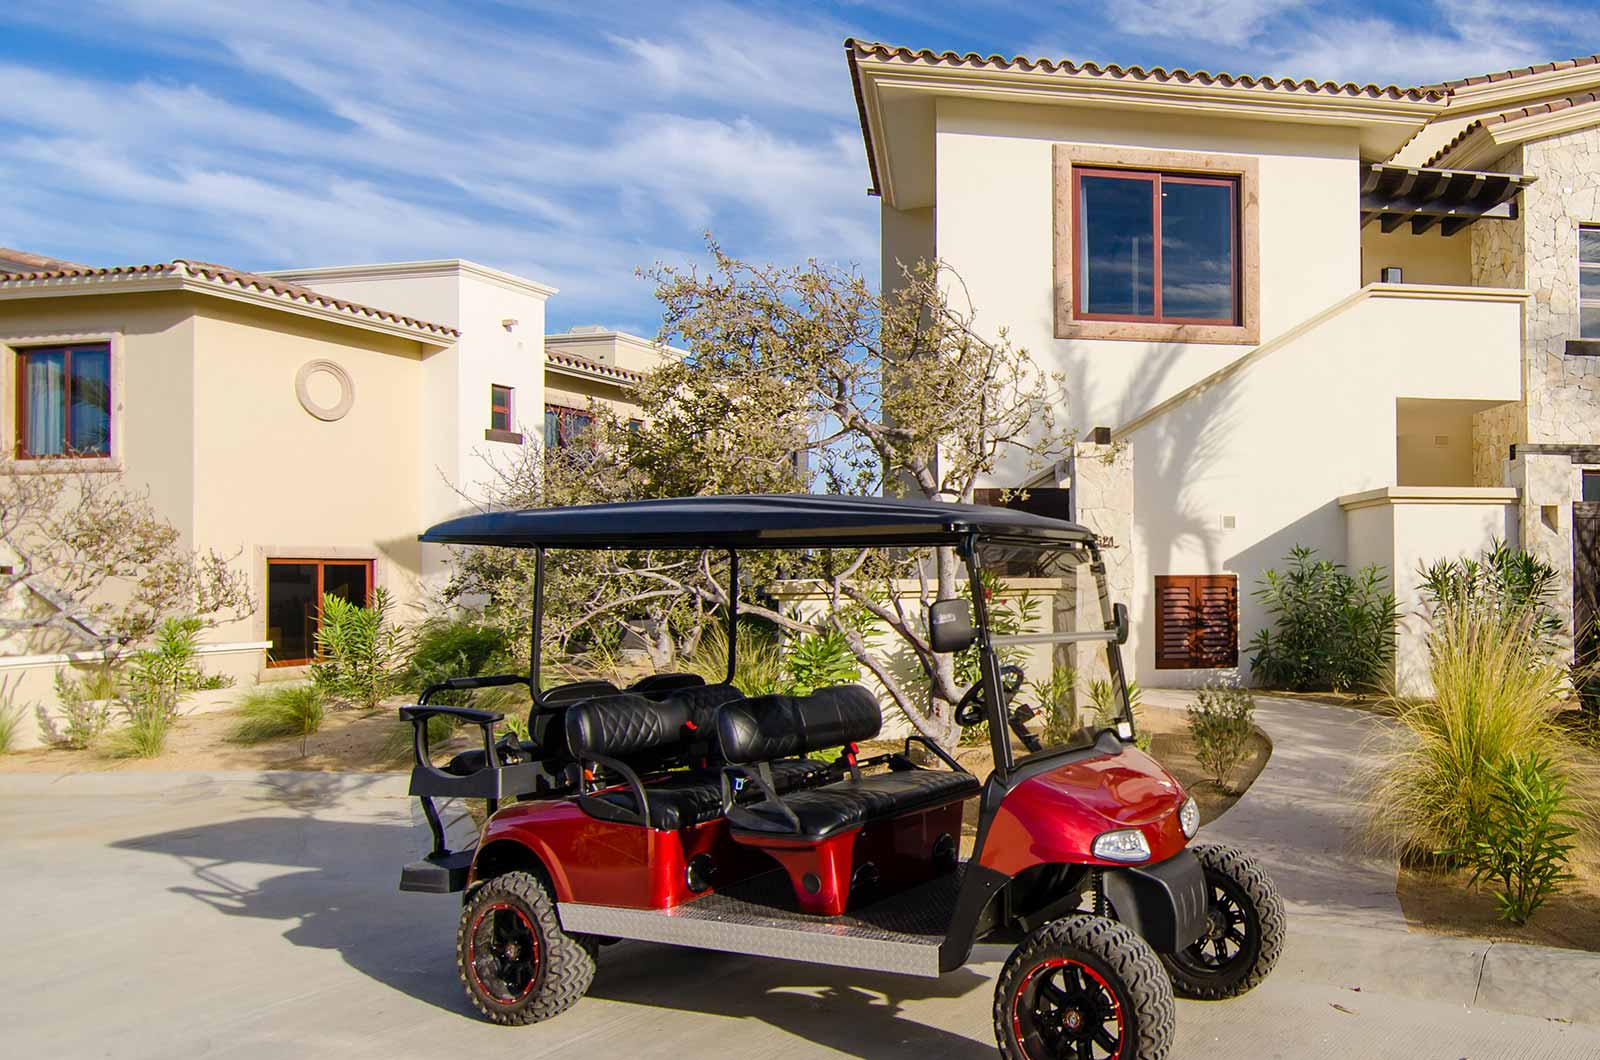 palmilla-dunes-golf-cart-2019-r2